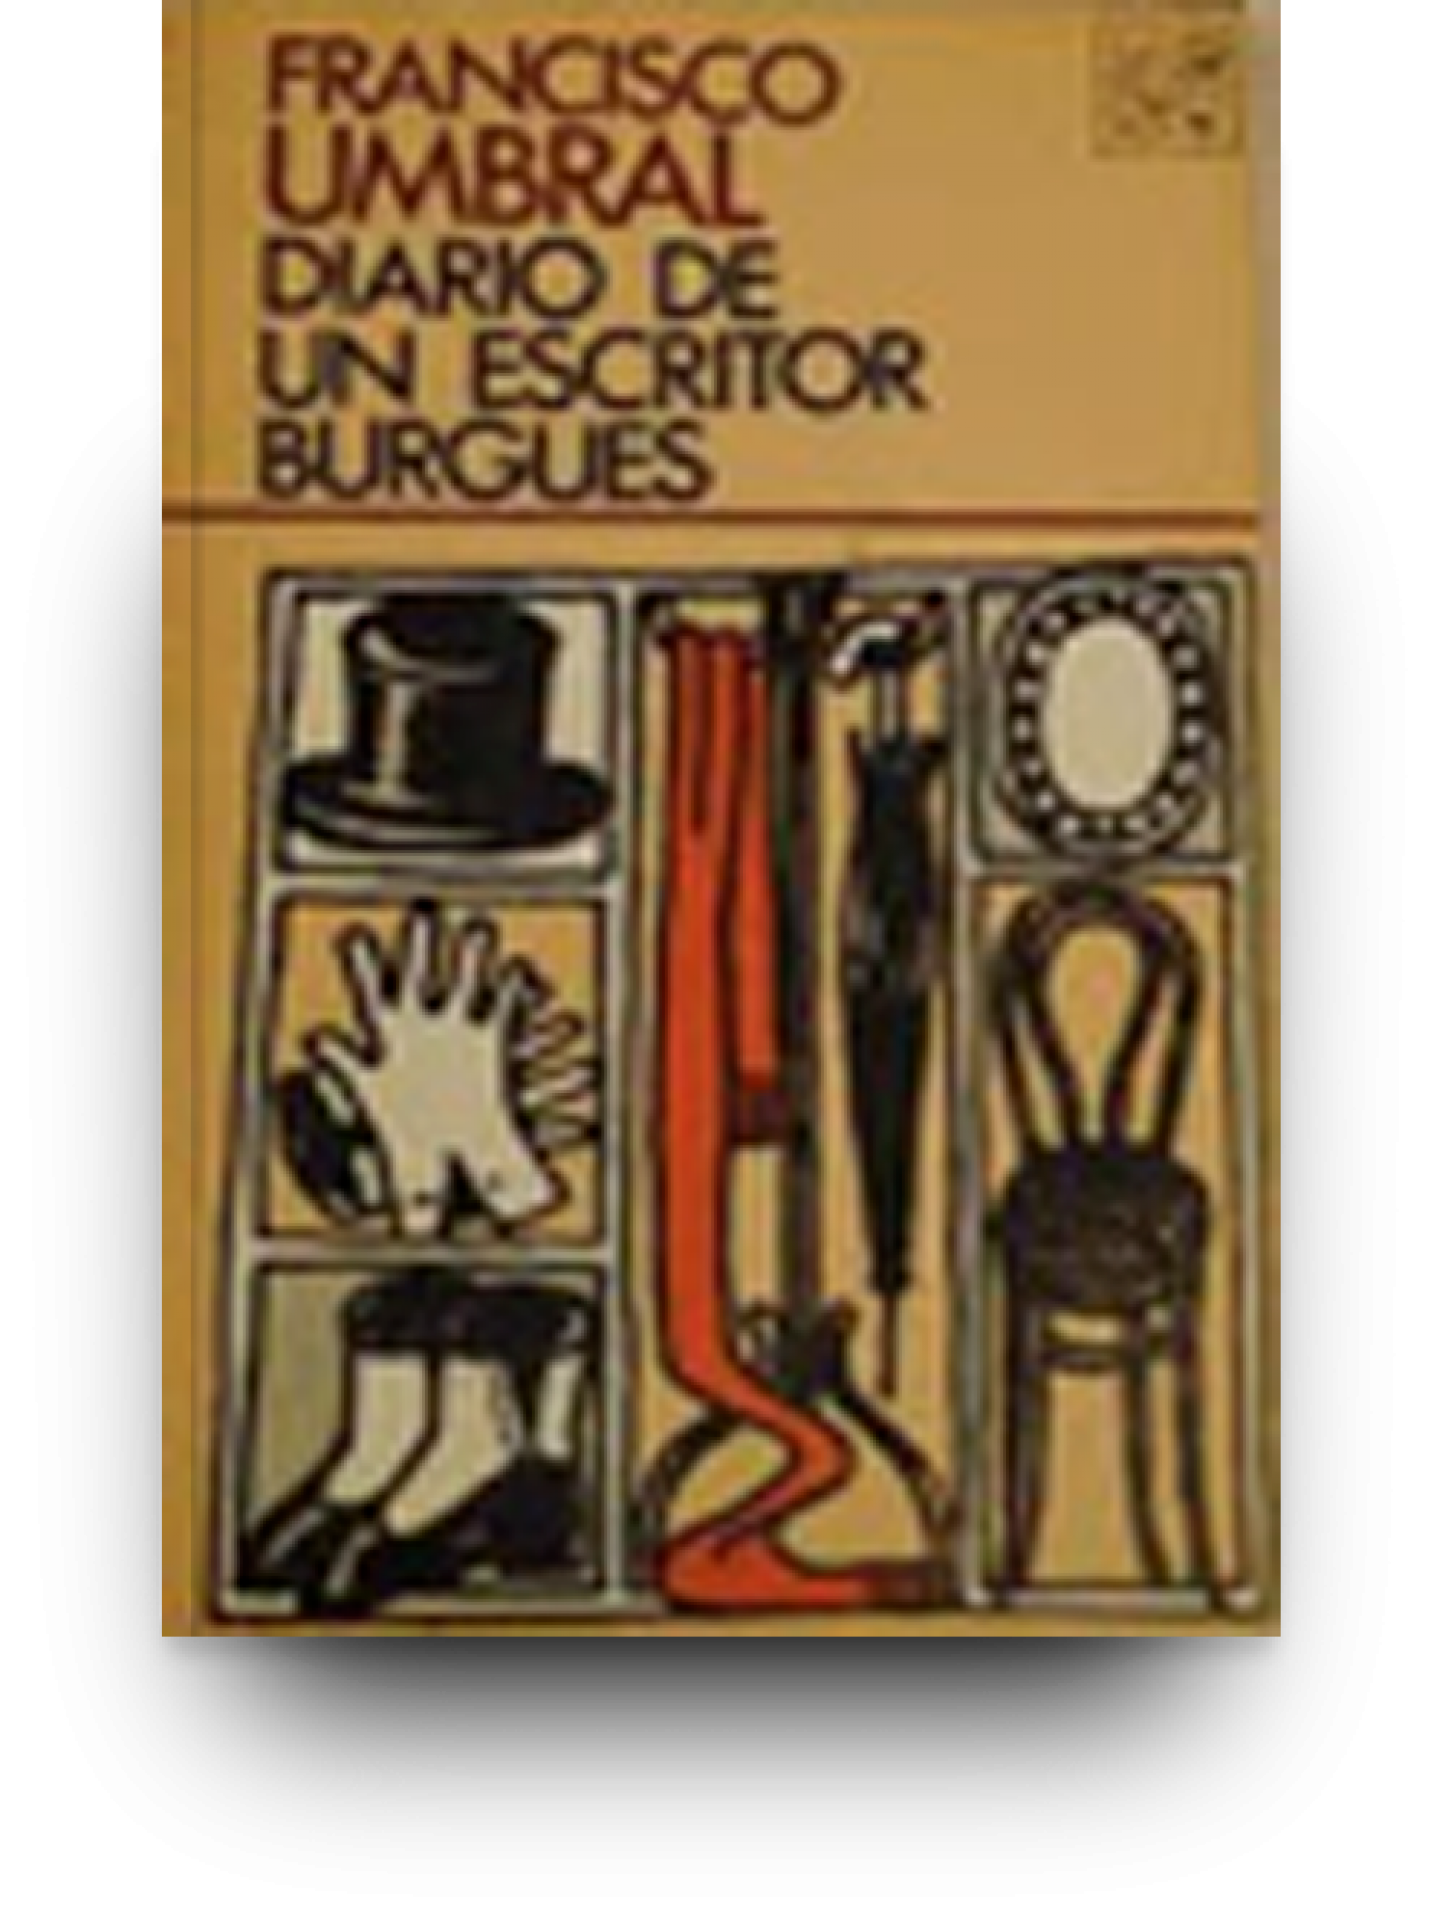 Diario de un escritor burgués